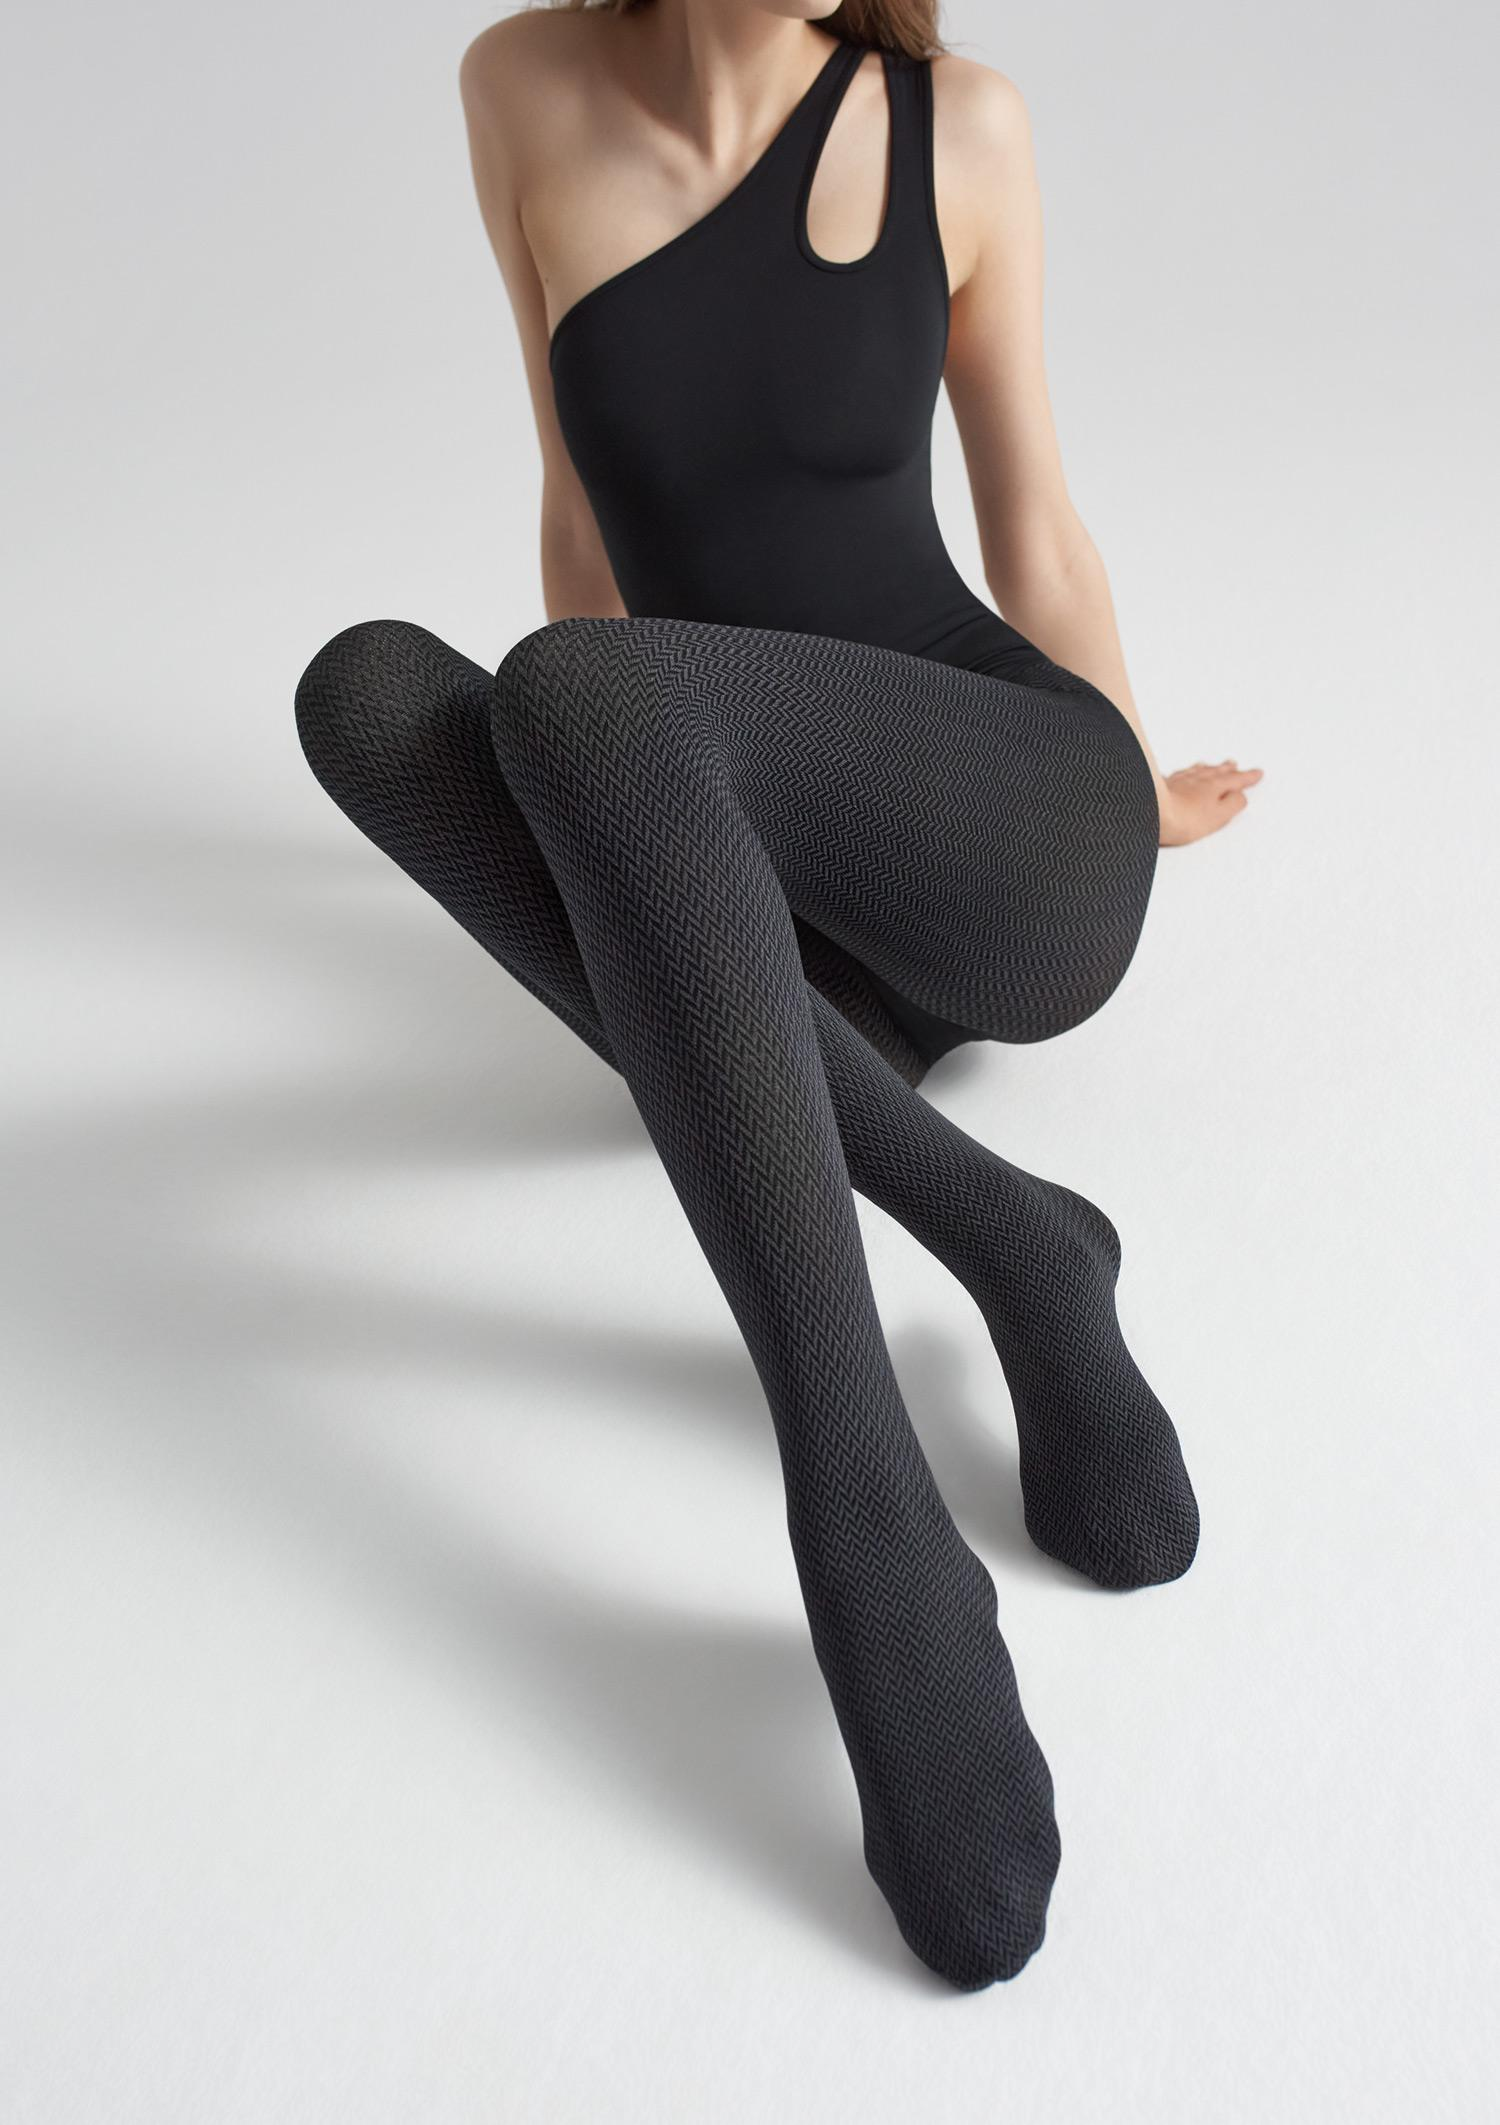 https://golden-legs.com.ua/images/stories/virtuemart/product/wzorzyste-rajstopy-z-mikrofibry-grace-w03-marilyn_1.jpg